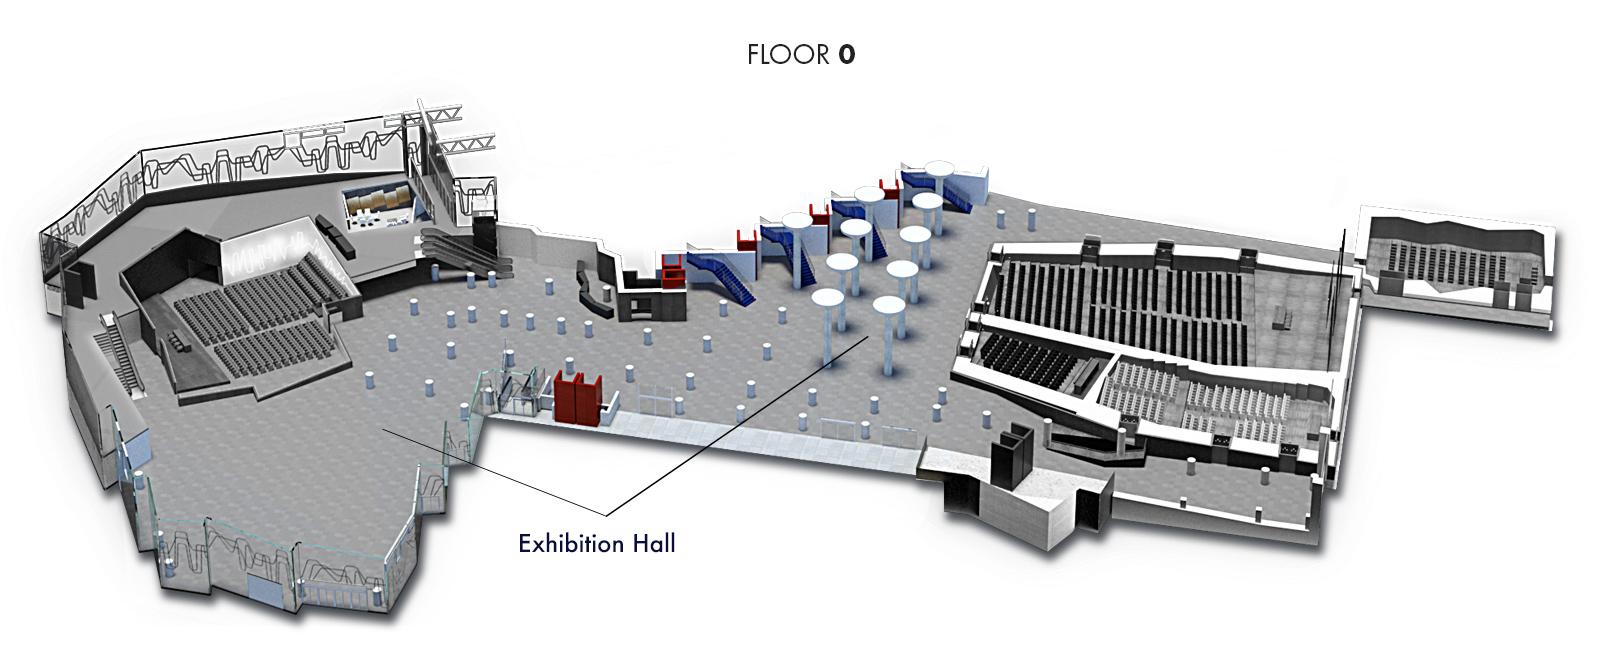 Exhibition Hall, Floor 0   Palacio Euskalduna Jauregia